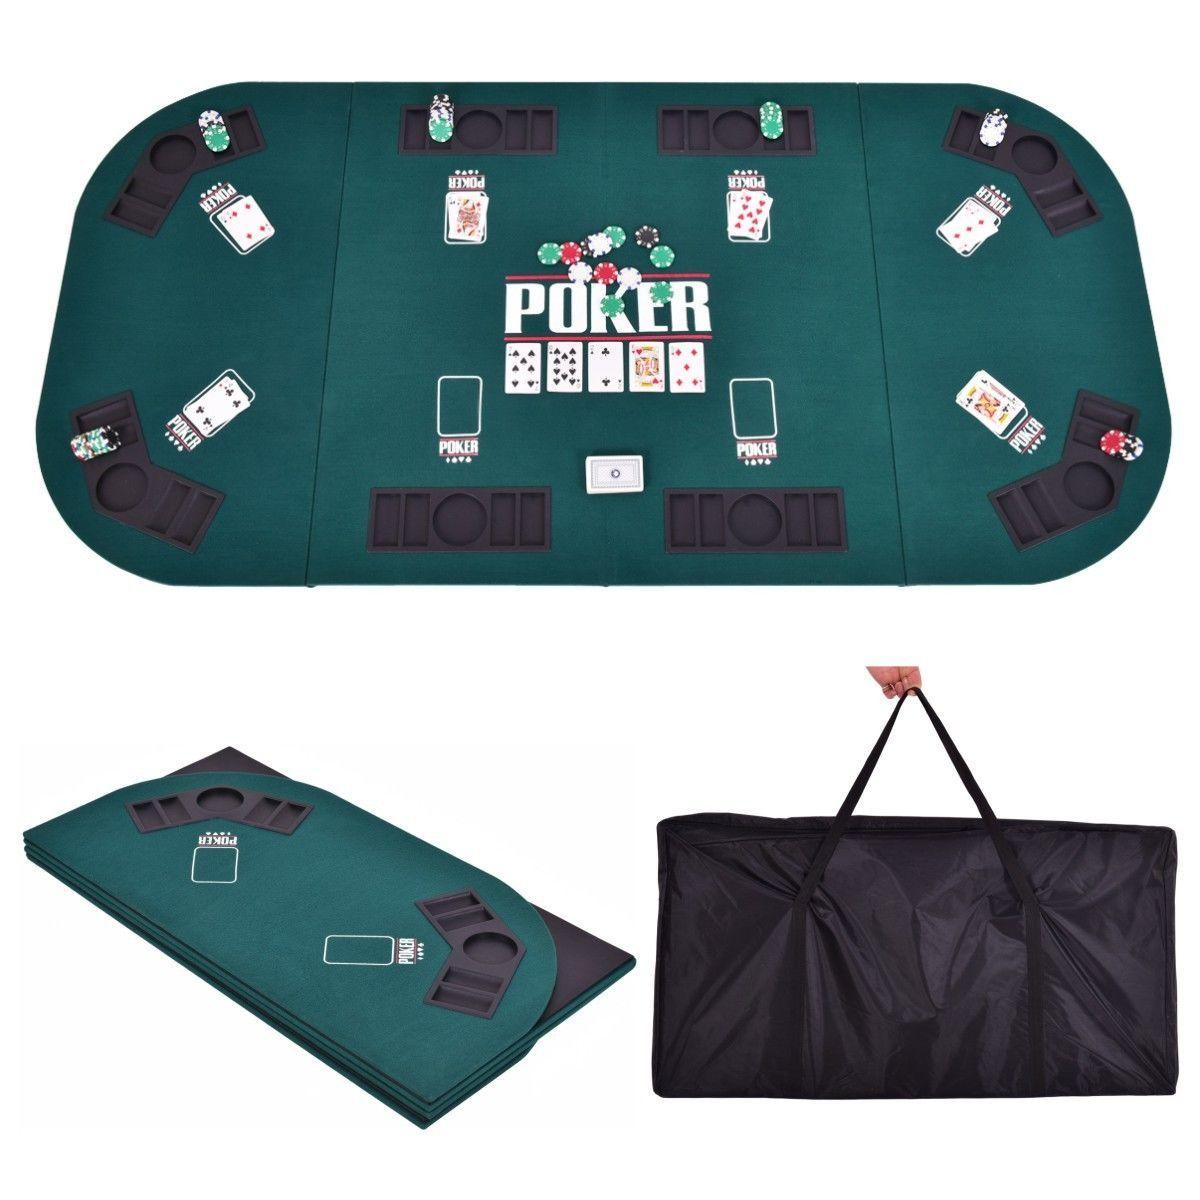 Folding Four Fold 8 Player Poker Table Top Carrying Case Portable Green Poker Table Top Poker Table Poker Table Plans